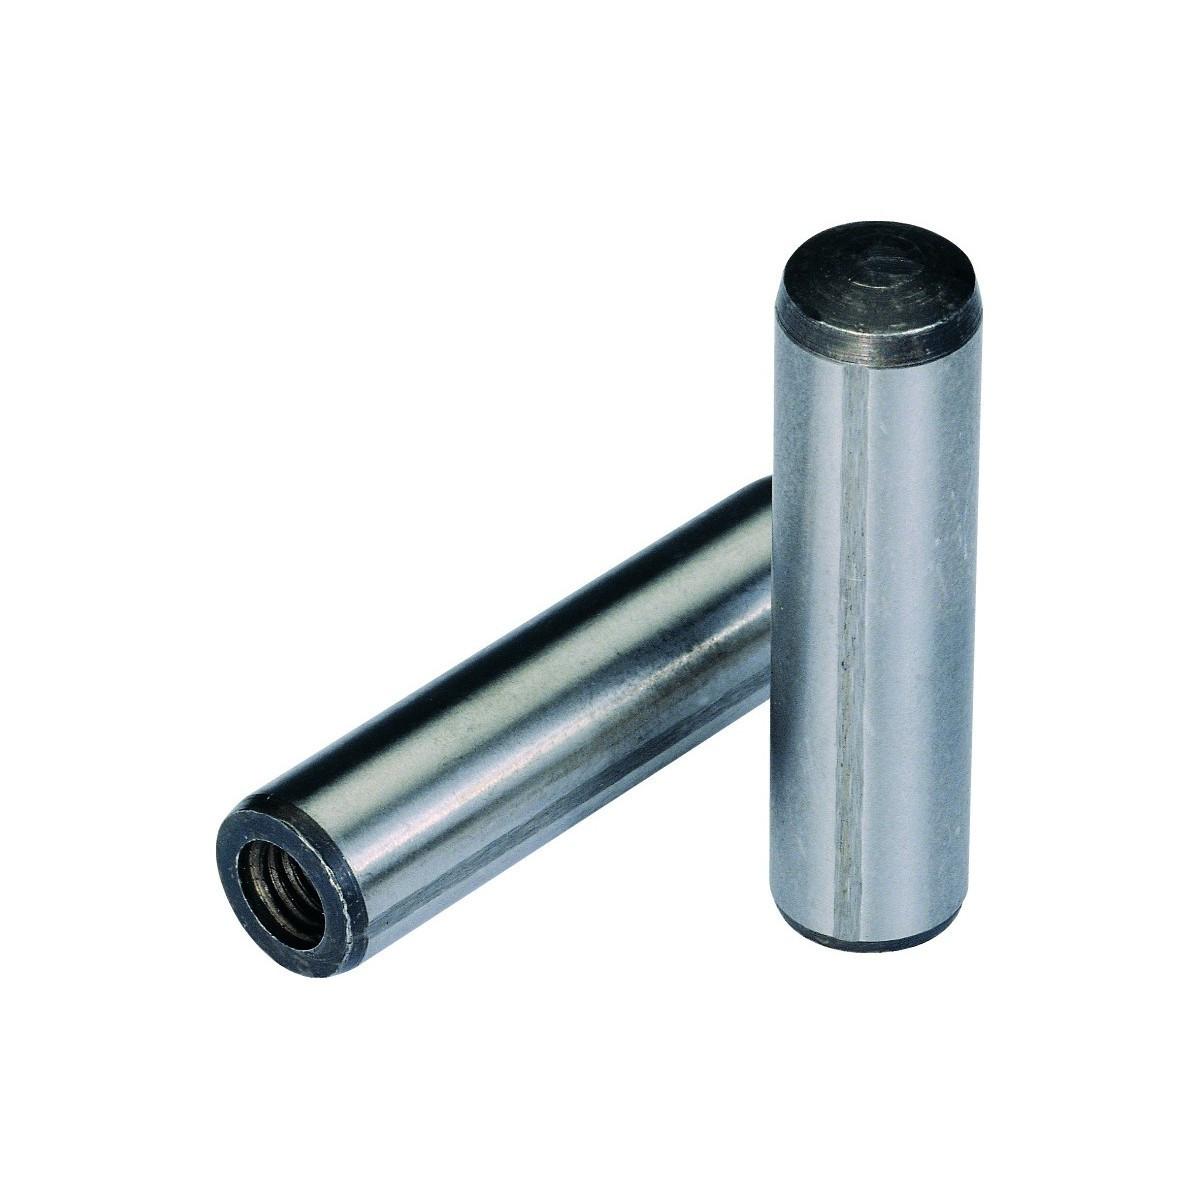 Штифт цилиндрический MMG  DIN 7979D M8 х 24 Класс 10.9 (Фосфат) 1 шт